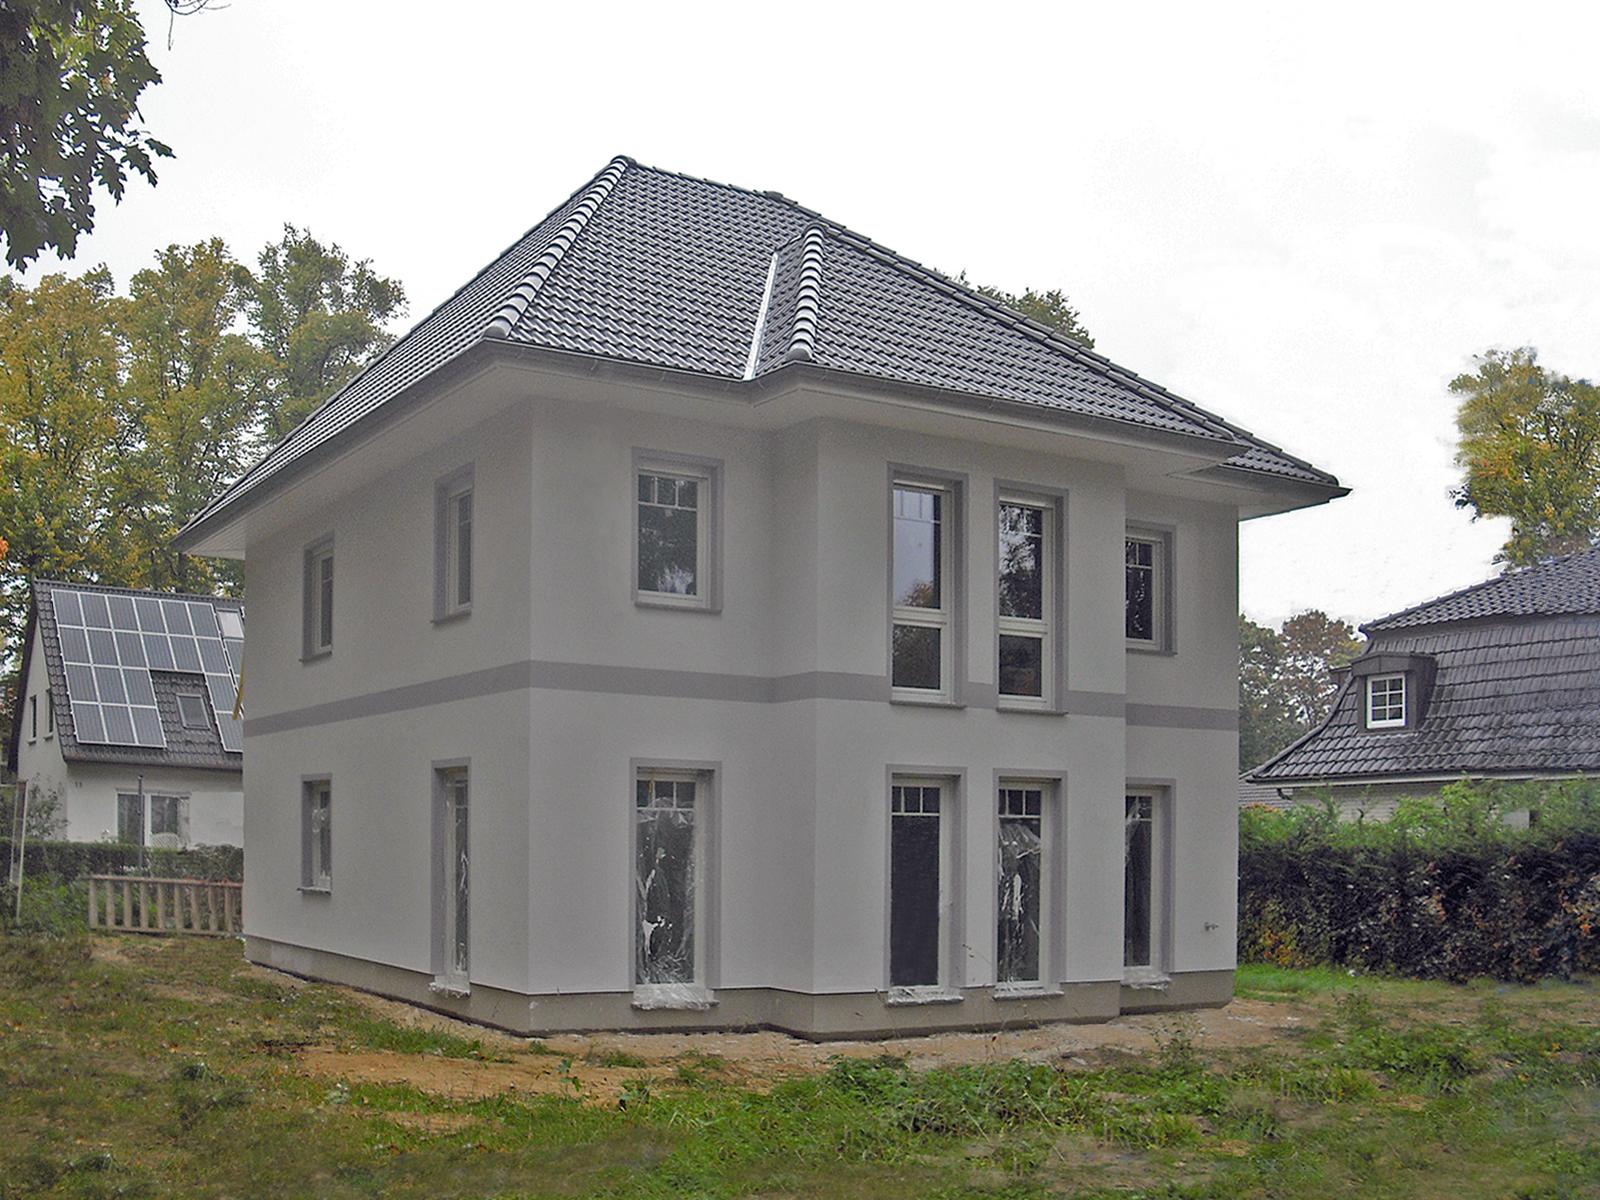 Stadtvilla archives presseportal inar for Stadtvilla zweifamilienhaus